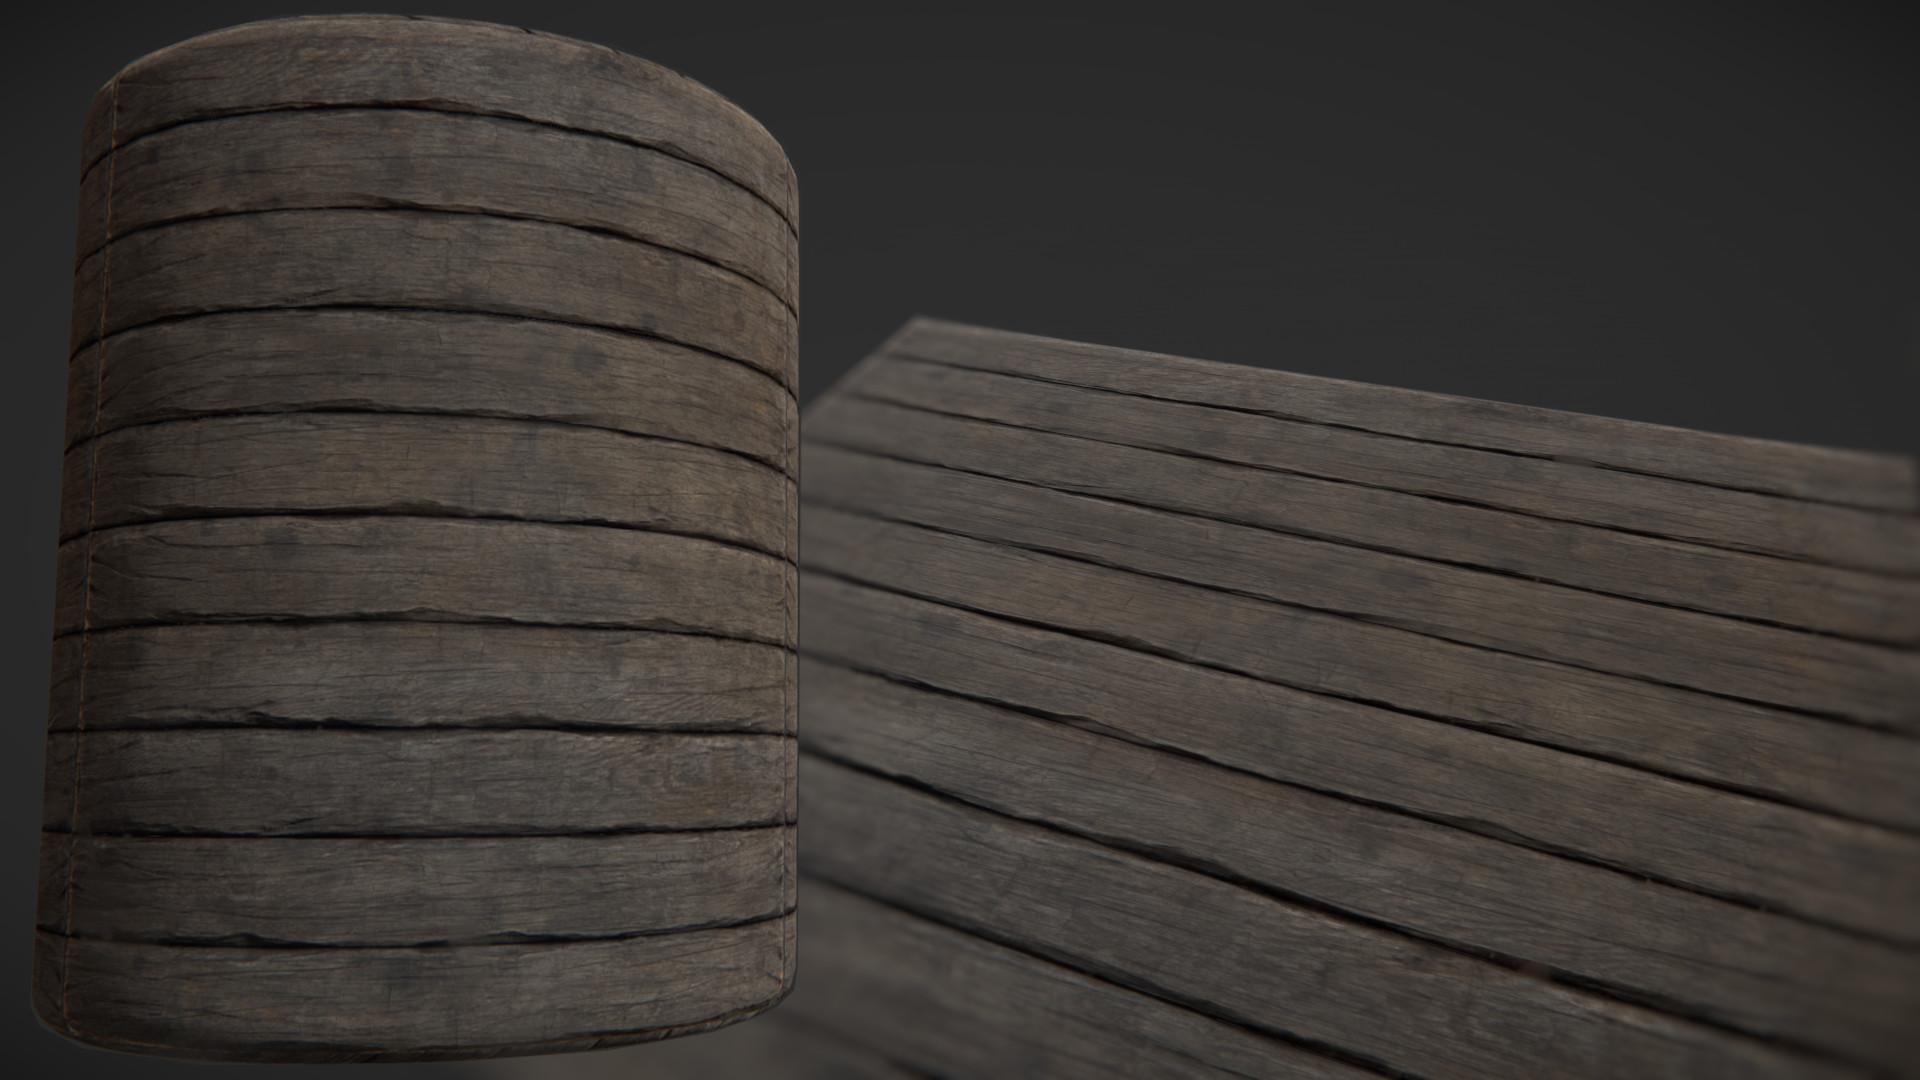 Najim filali saksak woodplank screen01